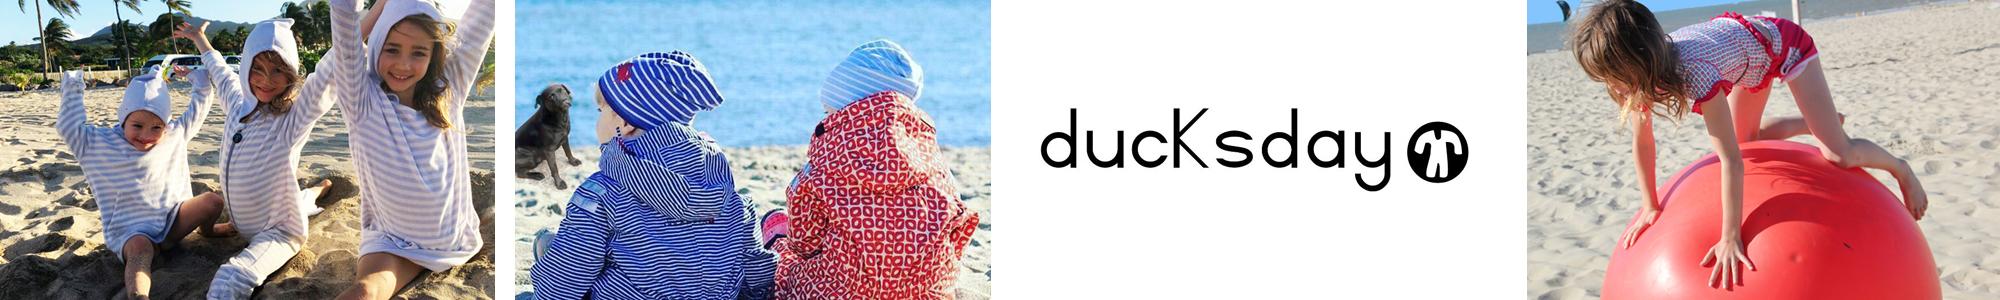 Ducksday